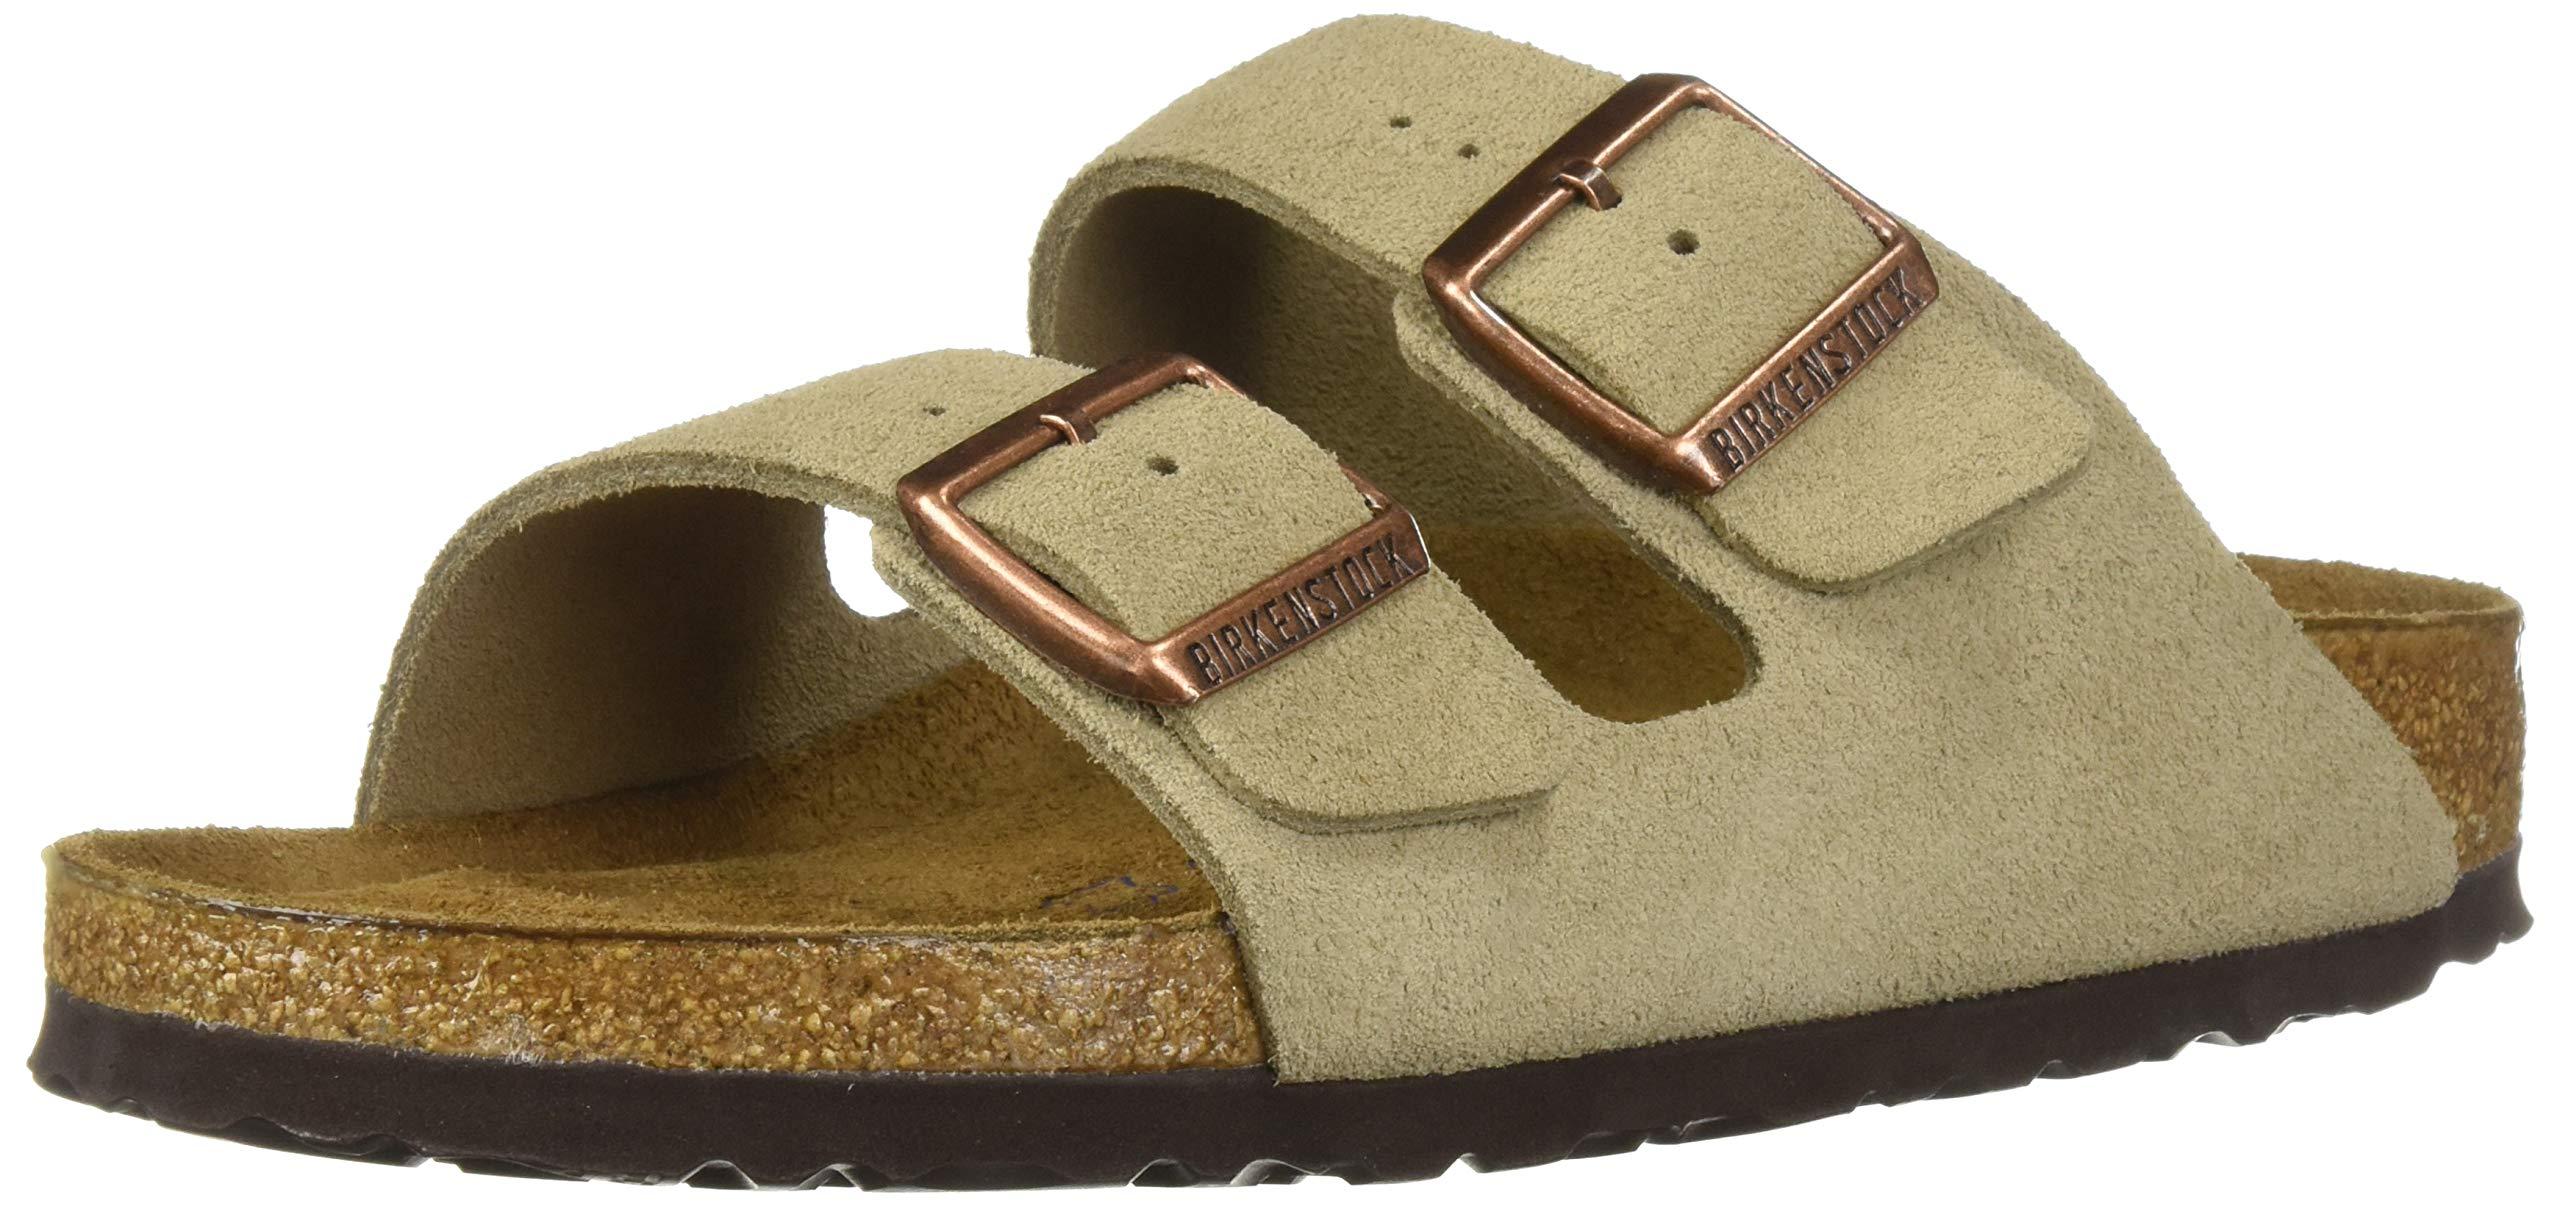 Birkenstock Unisex Arizona Taupe Suede Sandals - 8-8.5 2A(N) US Women by Birkenstock